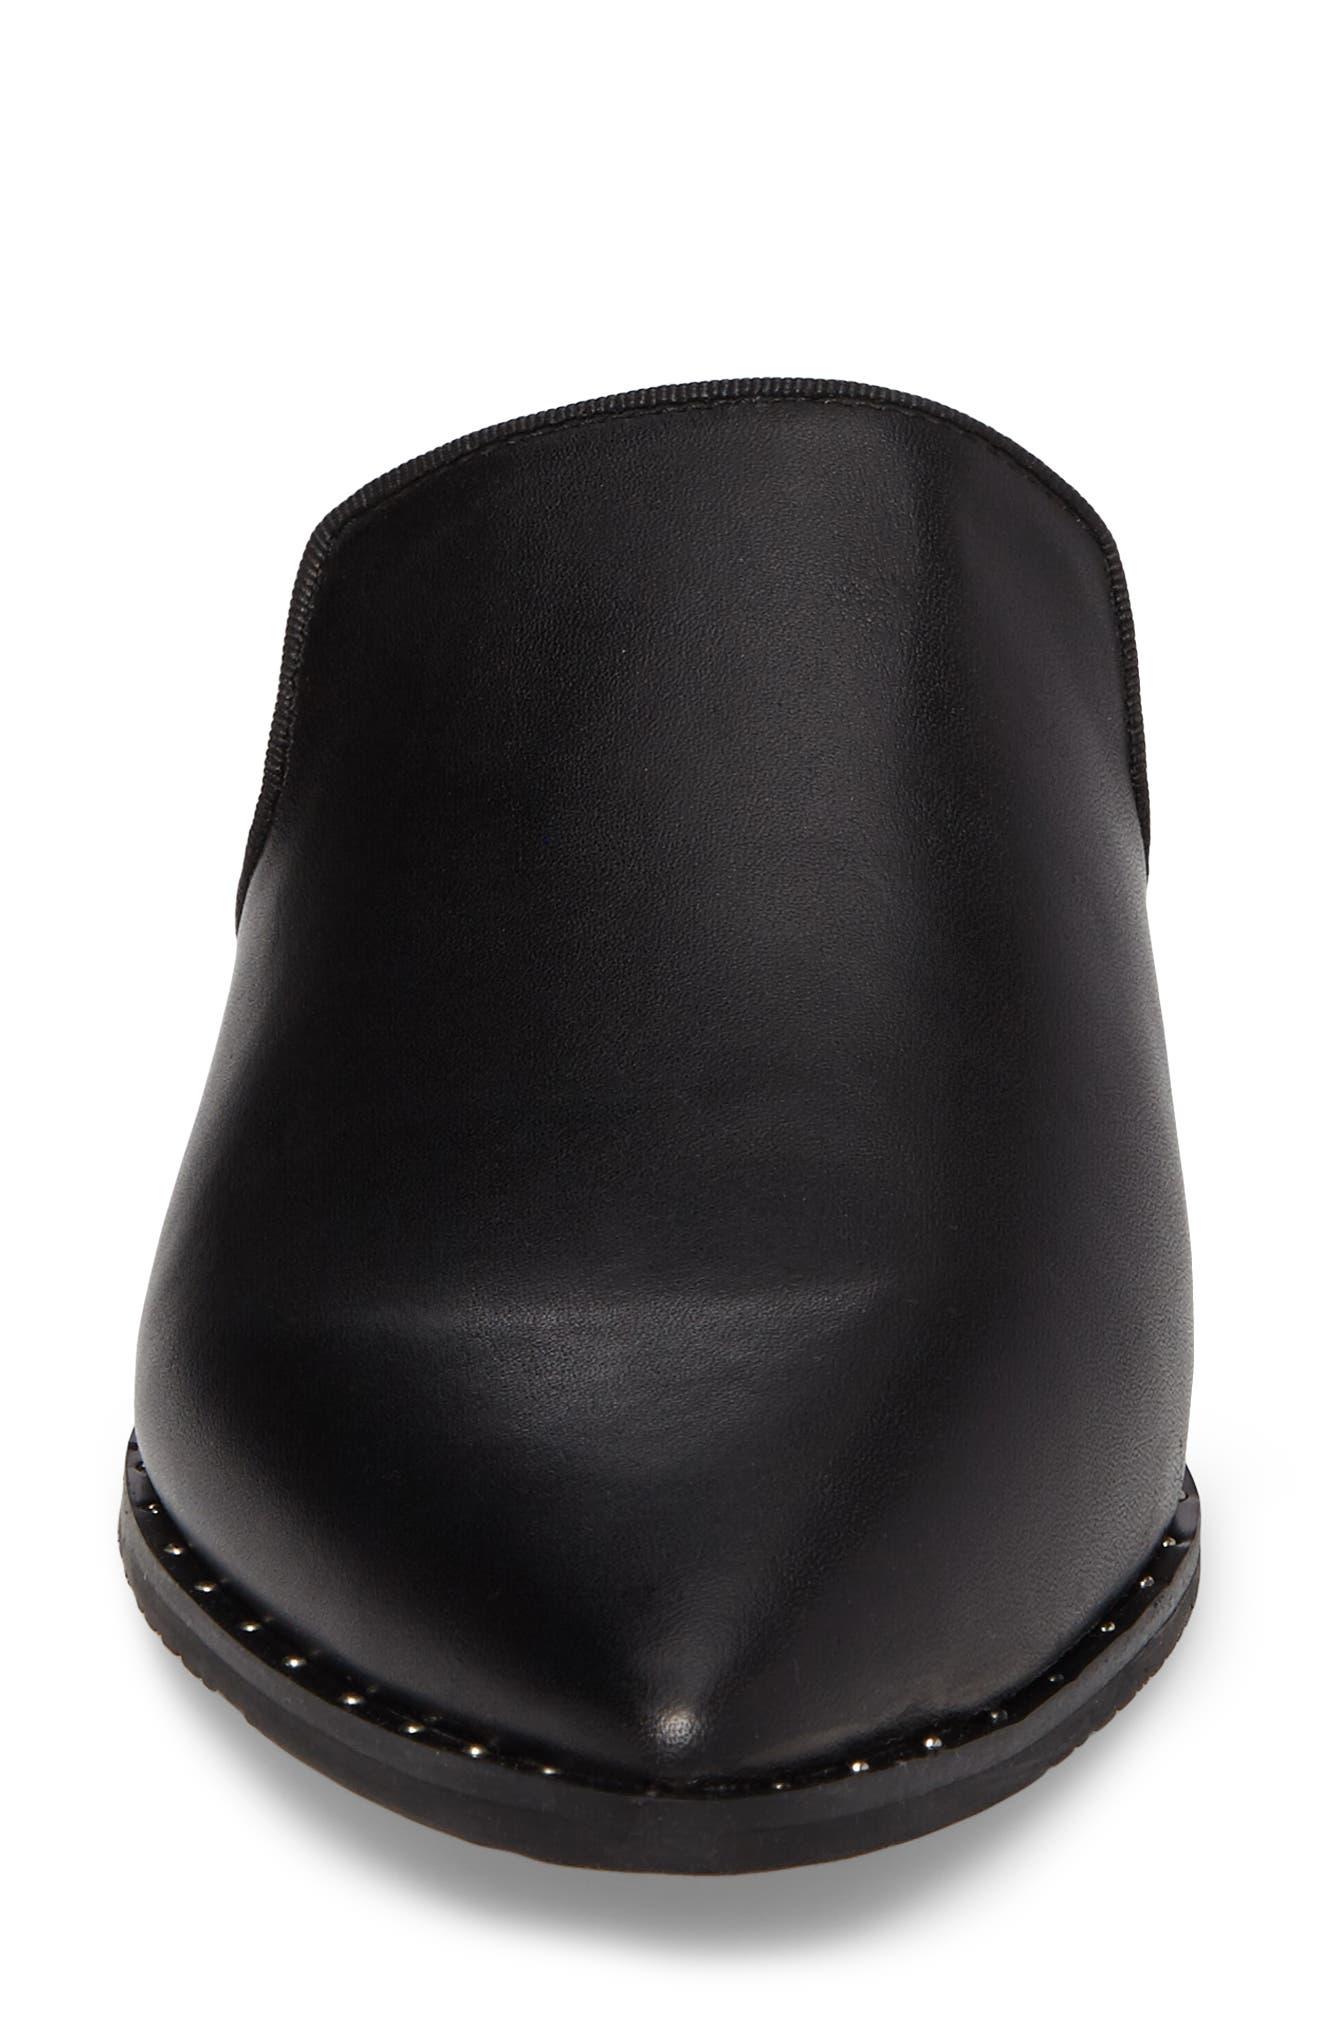 Keaton Loafer Mule,                             Alternate thumbnail 4, color,                             Black Leather